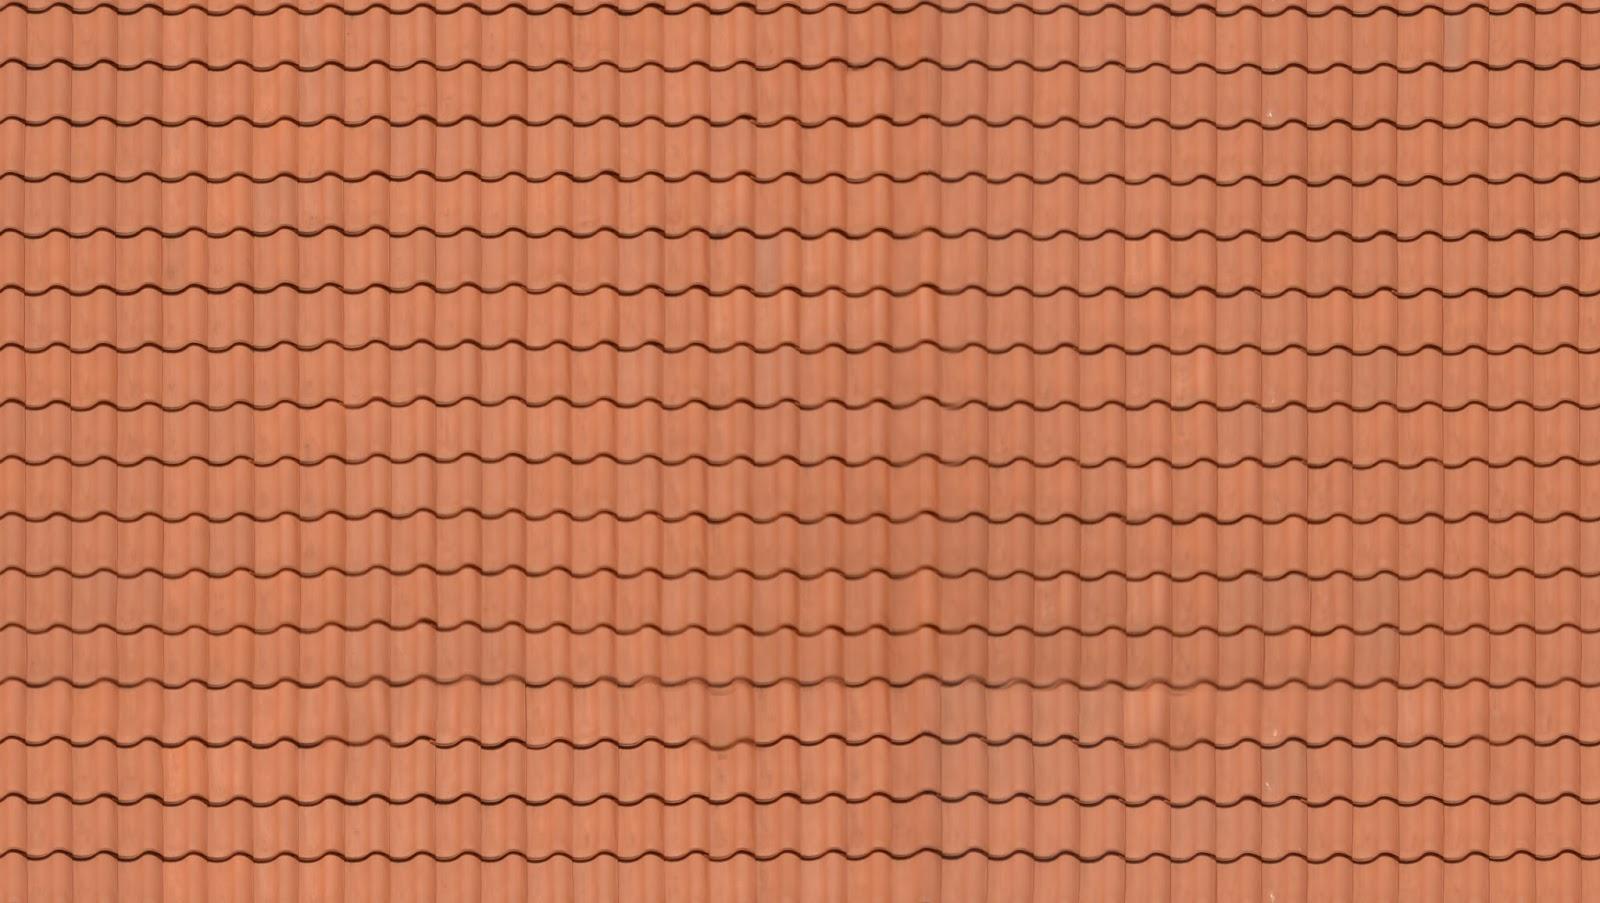 Ipat2015 emilianavarreteruiz modelado 3d obtenci n de for Contemporary roofing materials